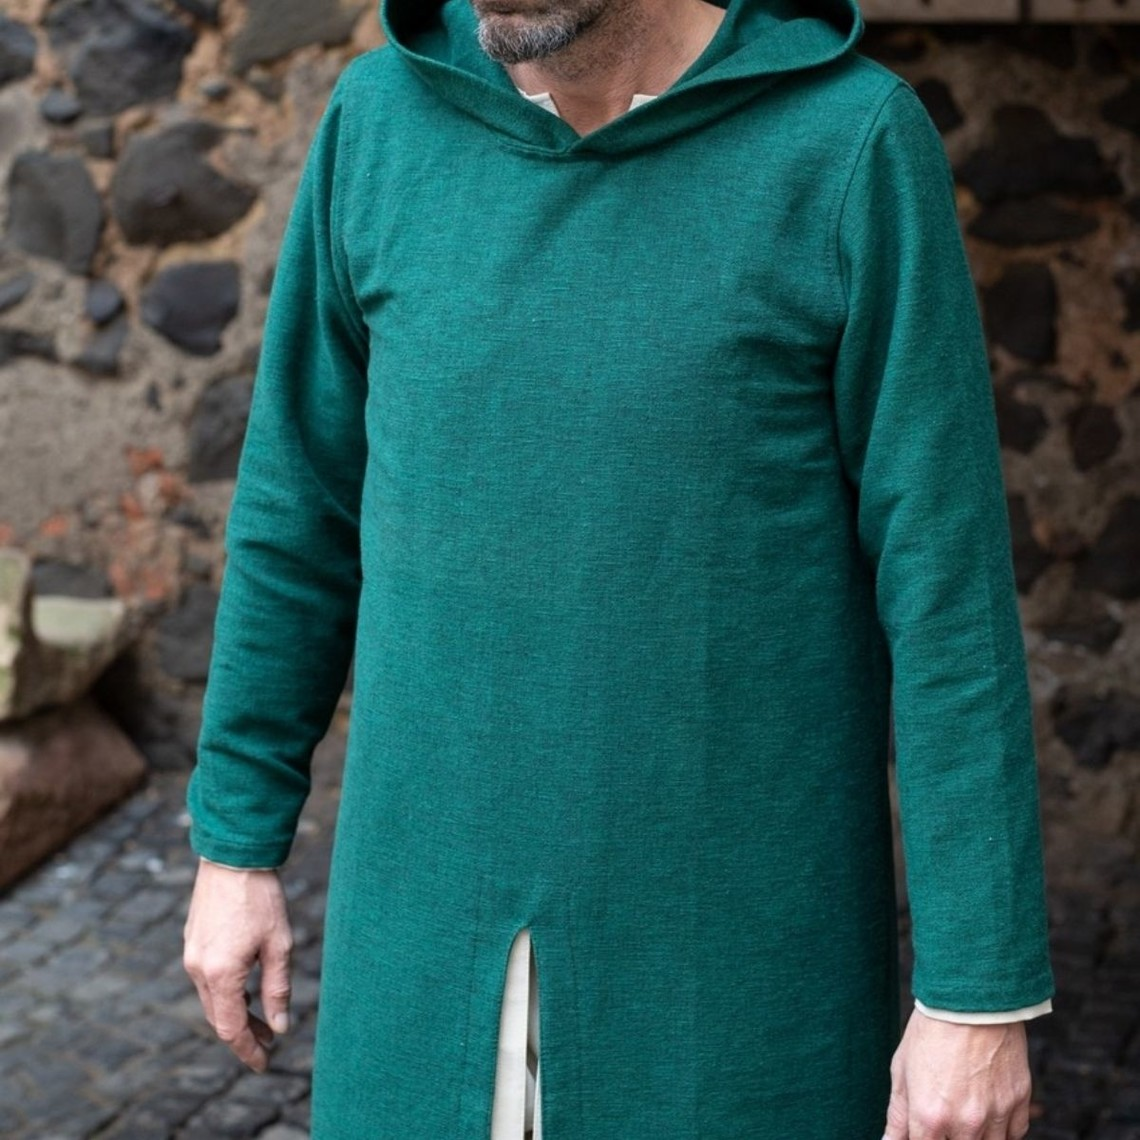 Burgschneider Túnica medieval con capucha Renaud, verde.